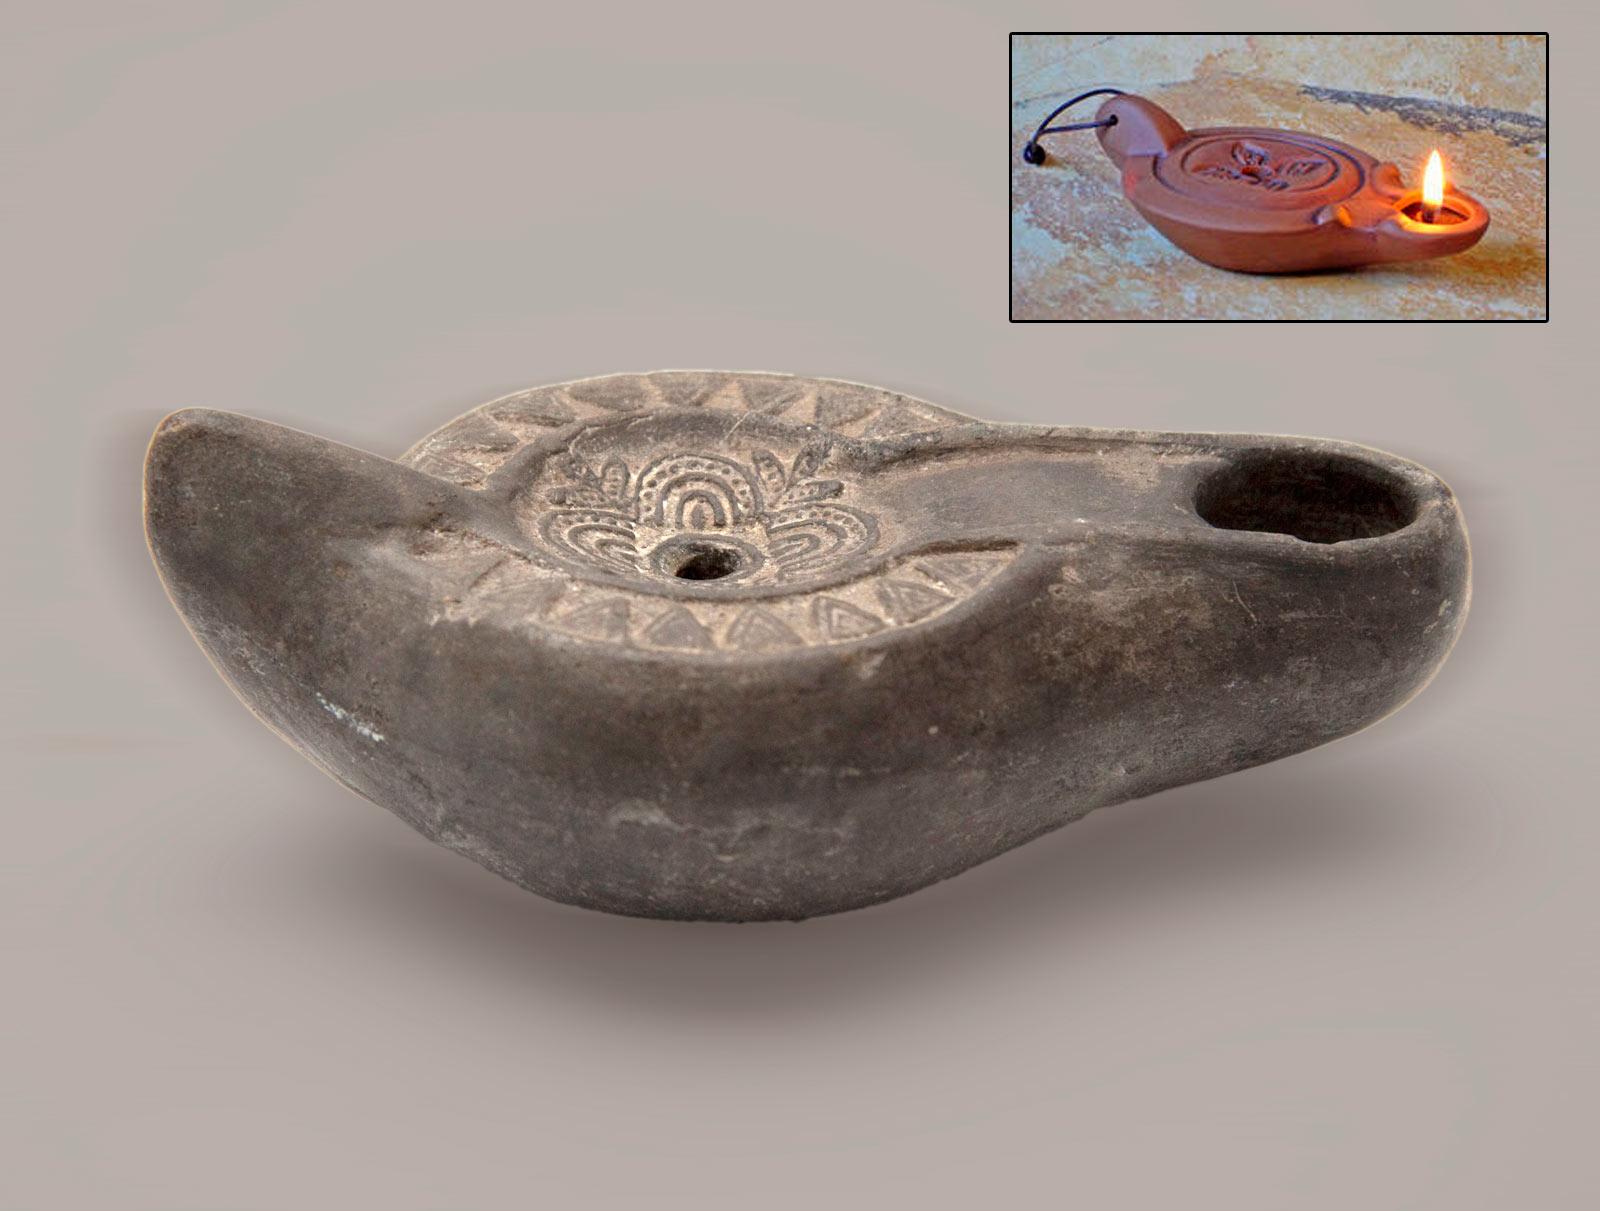 Lamp, unknown author, Heraclea Lyncestis